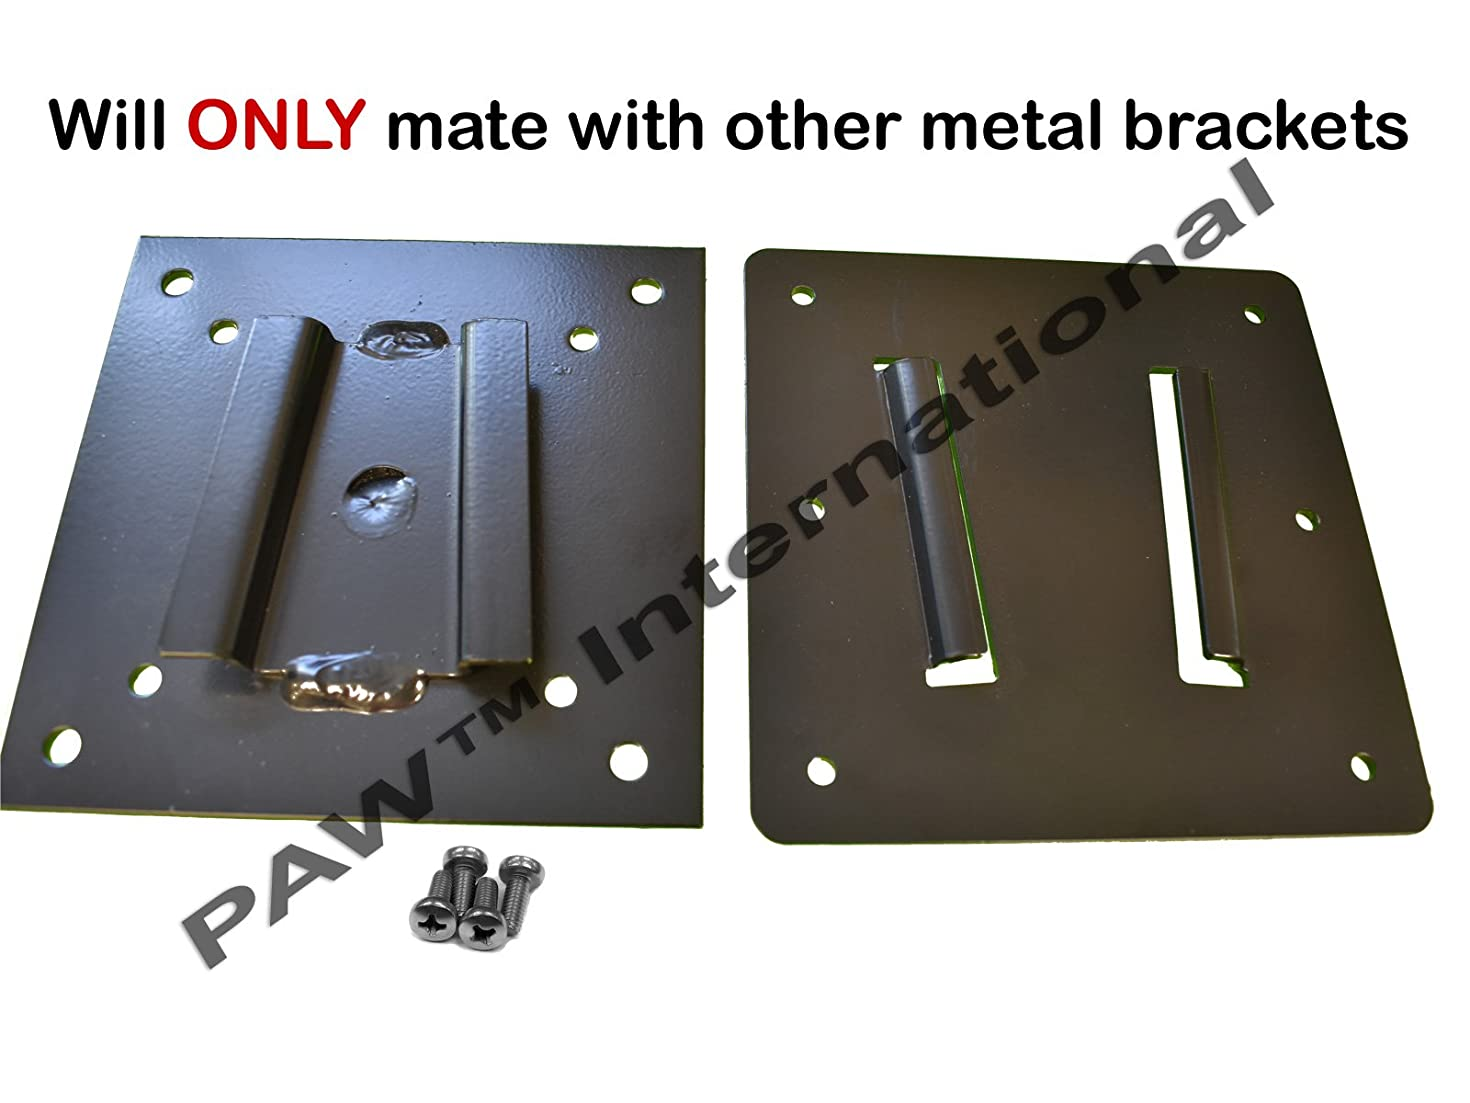 STEEL 2 Piece TV Bracket set for Campers/RVs-(Not PAW International Polymer Brackets)-